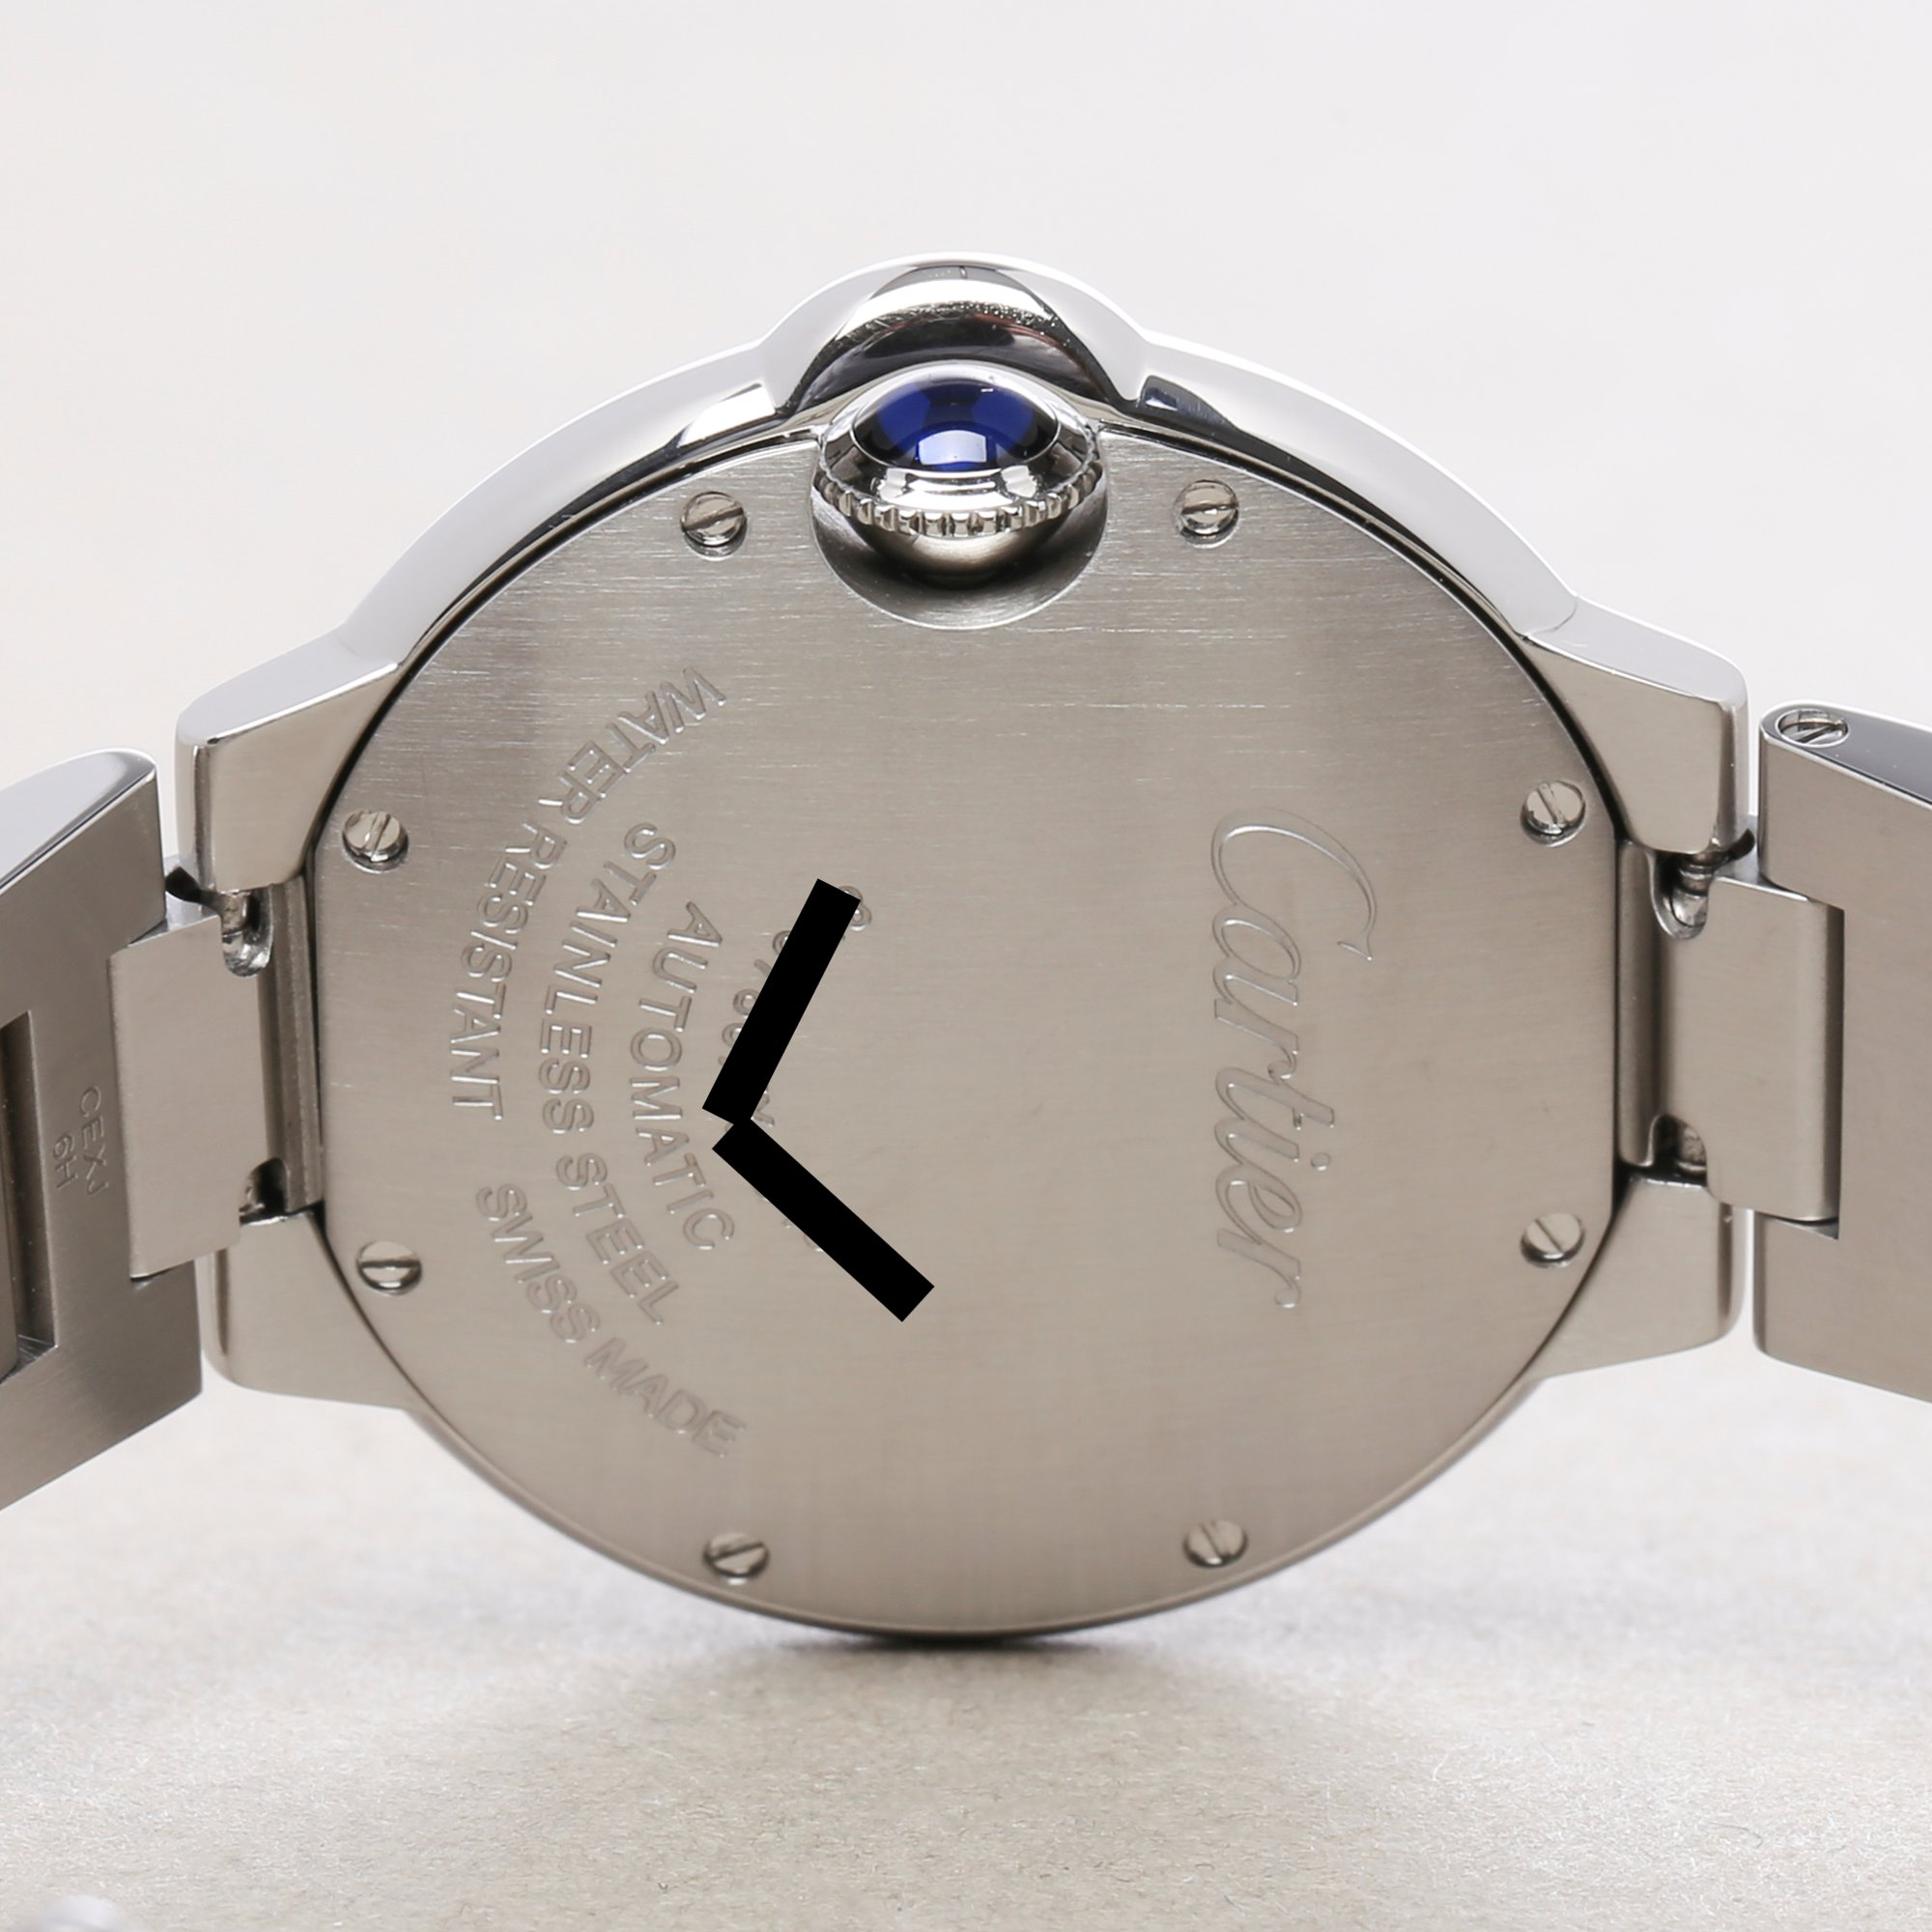 Cartier Ballon Bleu Automatic Stainless Steel W6920071 or 3489